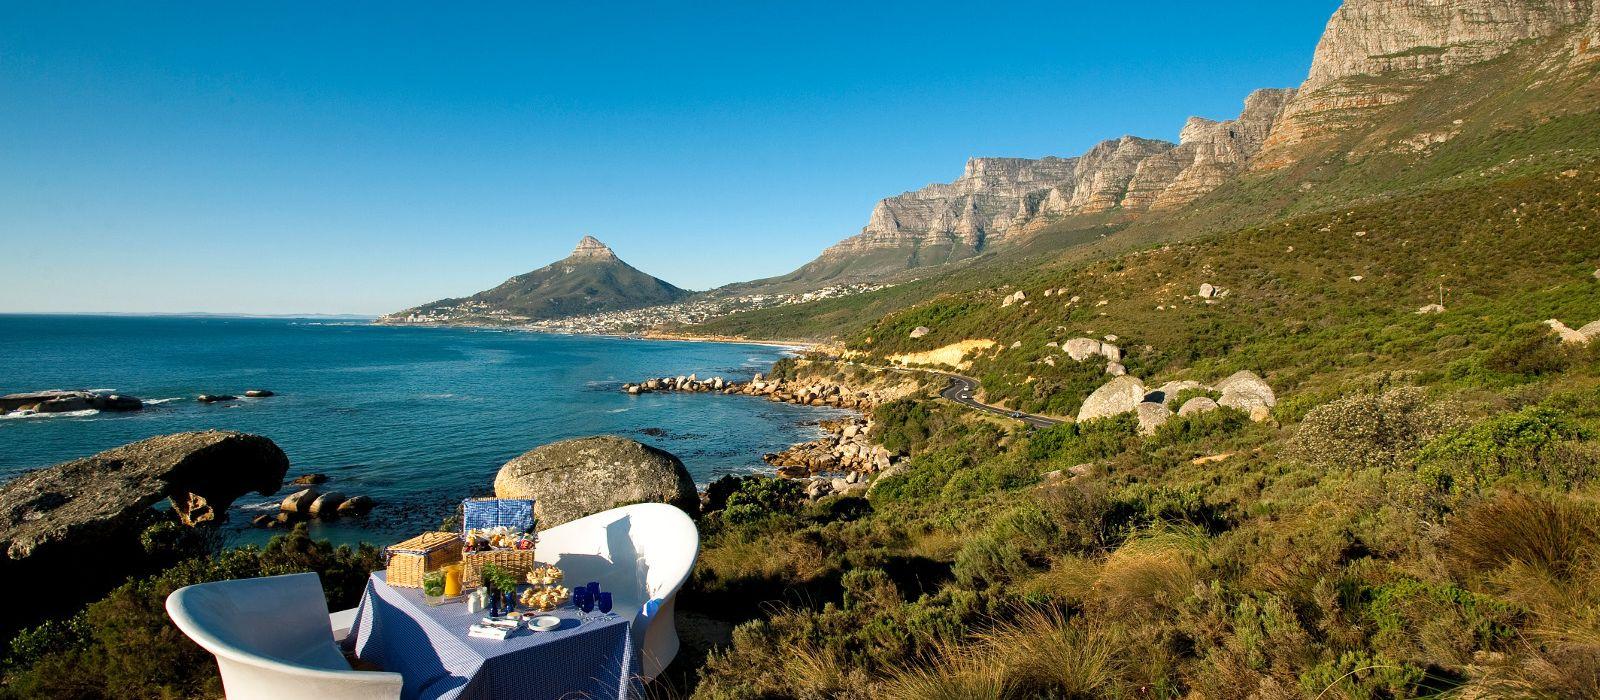 Südafrika: Kapstadt, Westkap und Krüger Nationalpark Urlaub 4